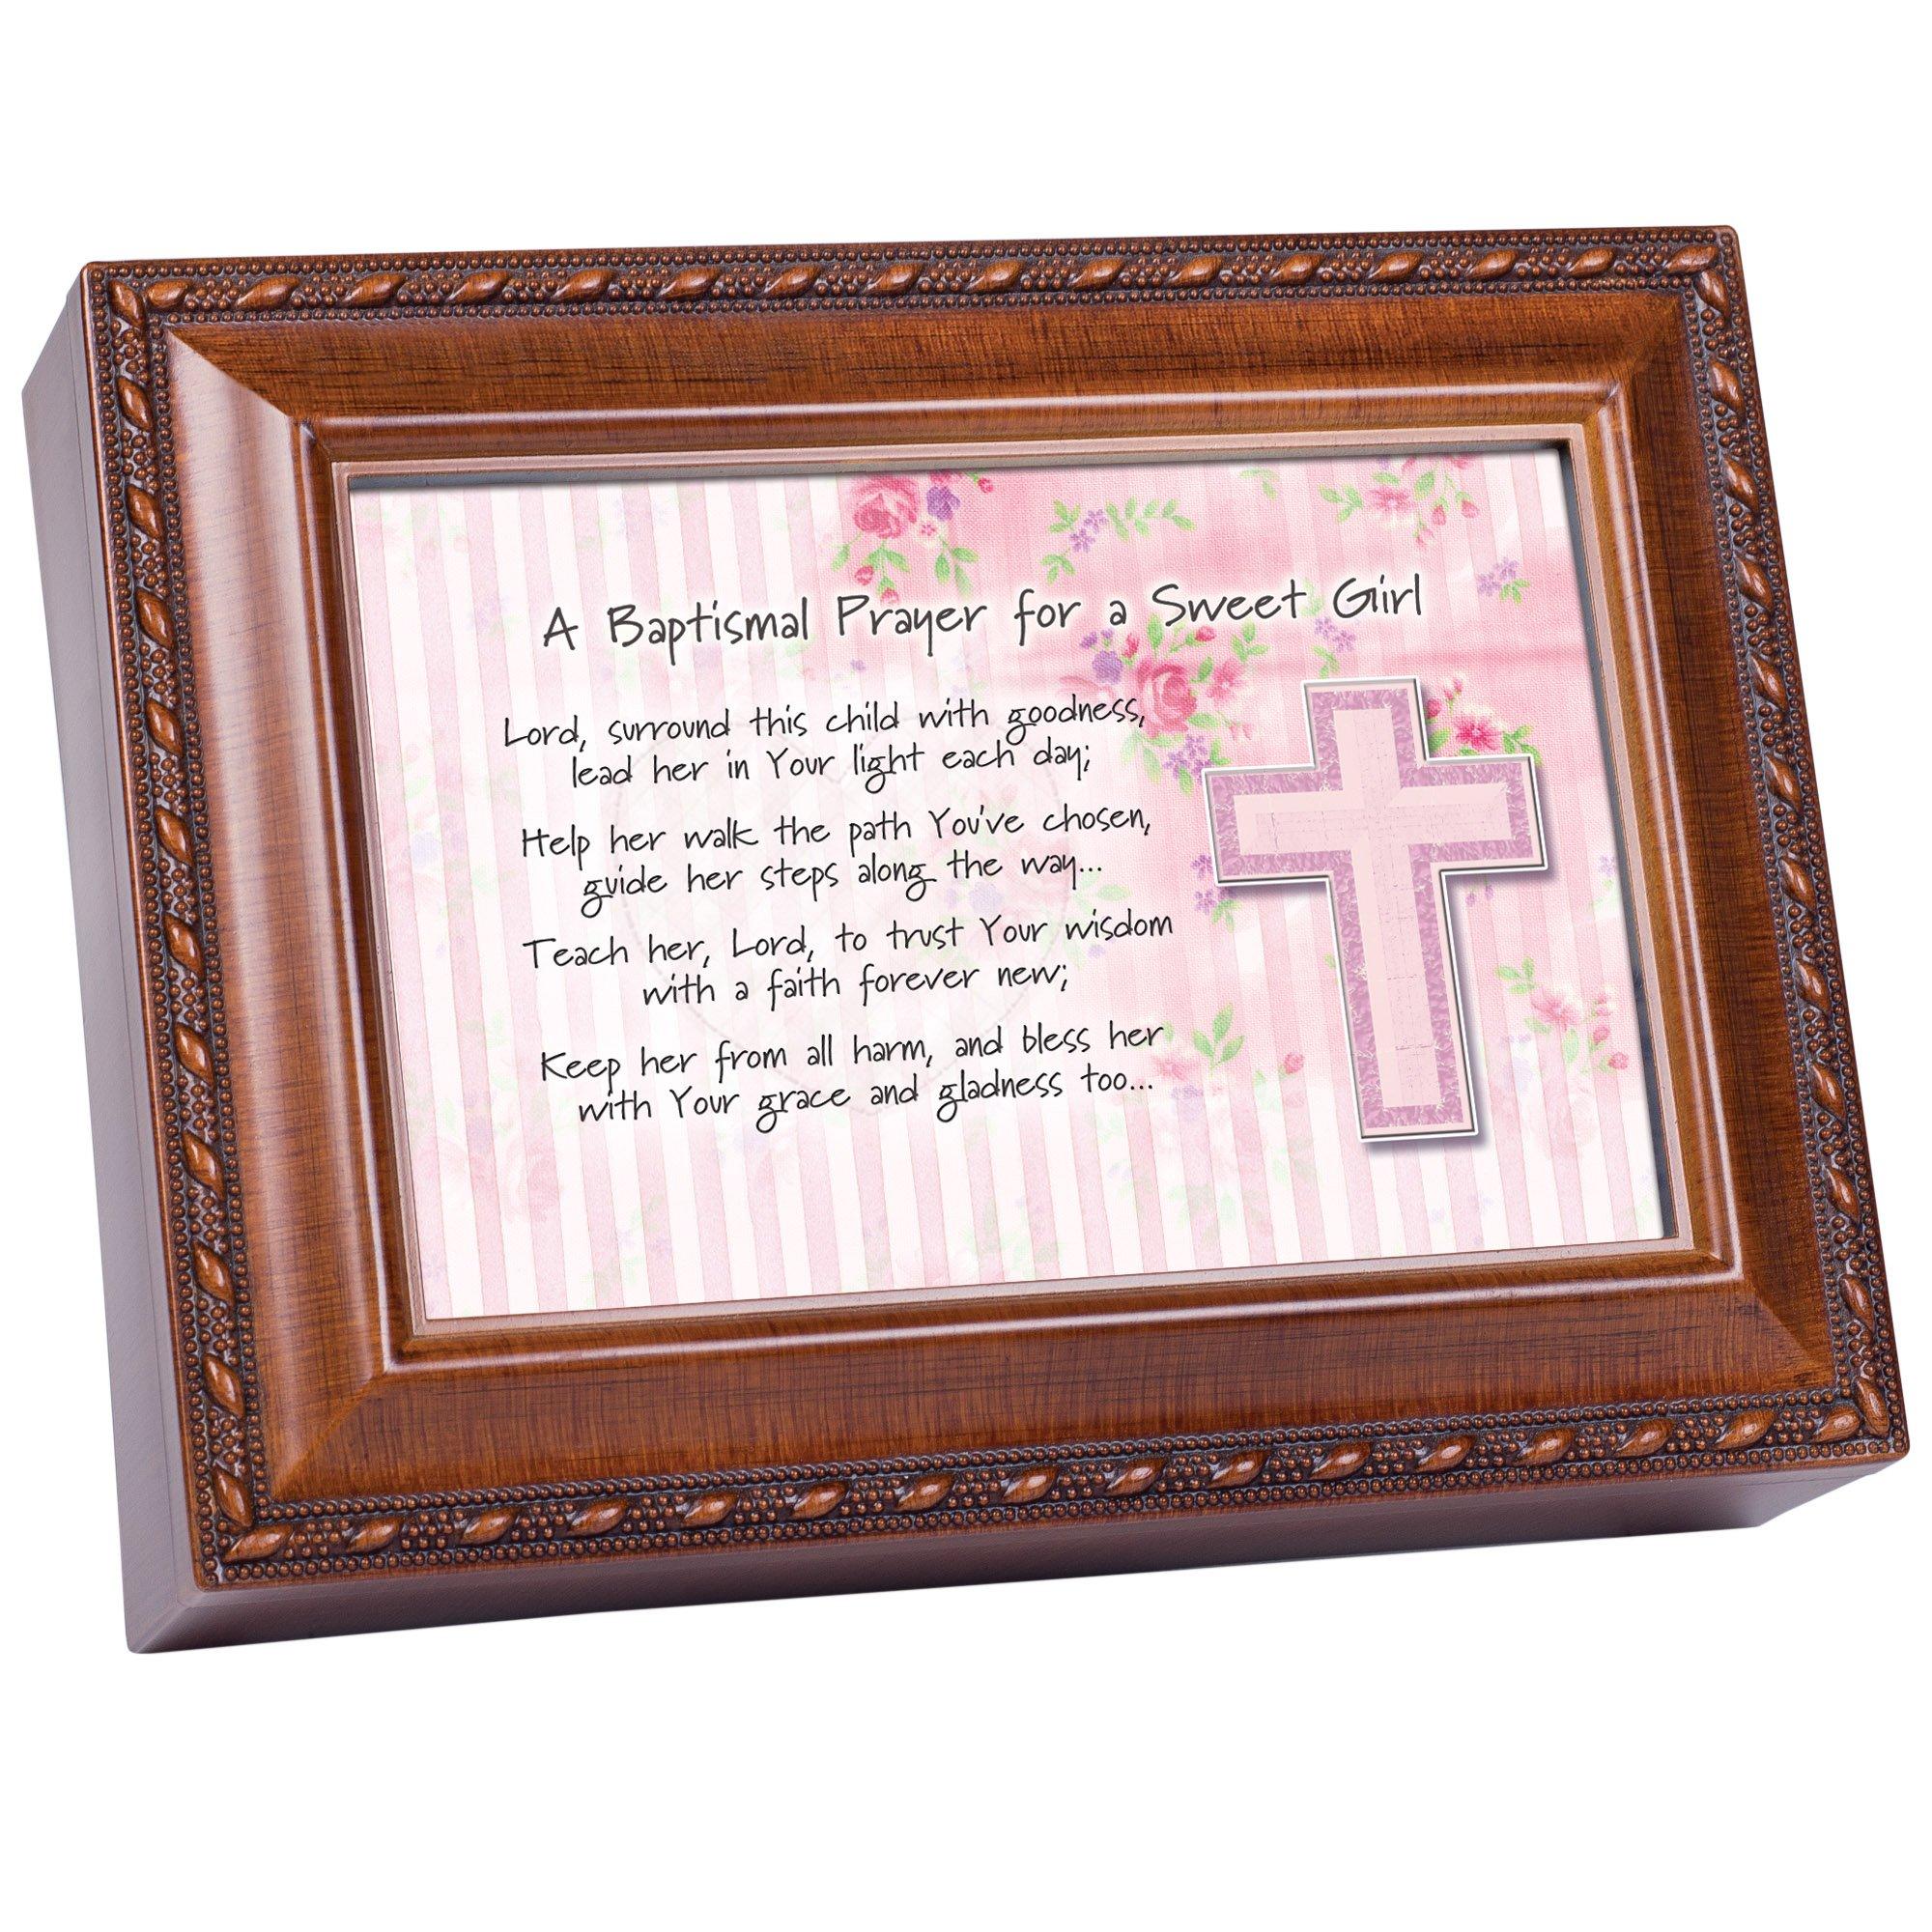 Cottage Garden Baptismal Prayer Lead Her Woodgrain Rope Trim Jewelry Music Box Plays Jesus Loves Me